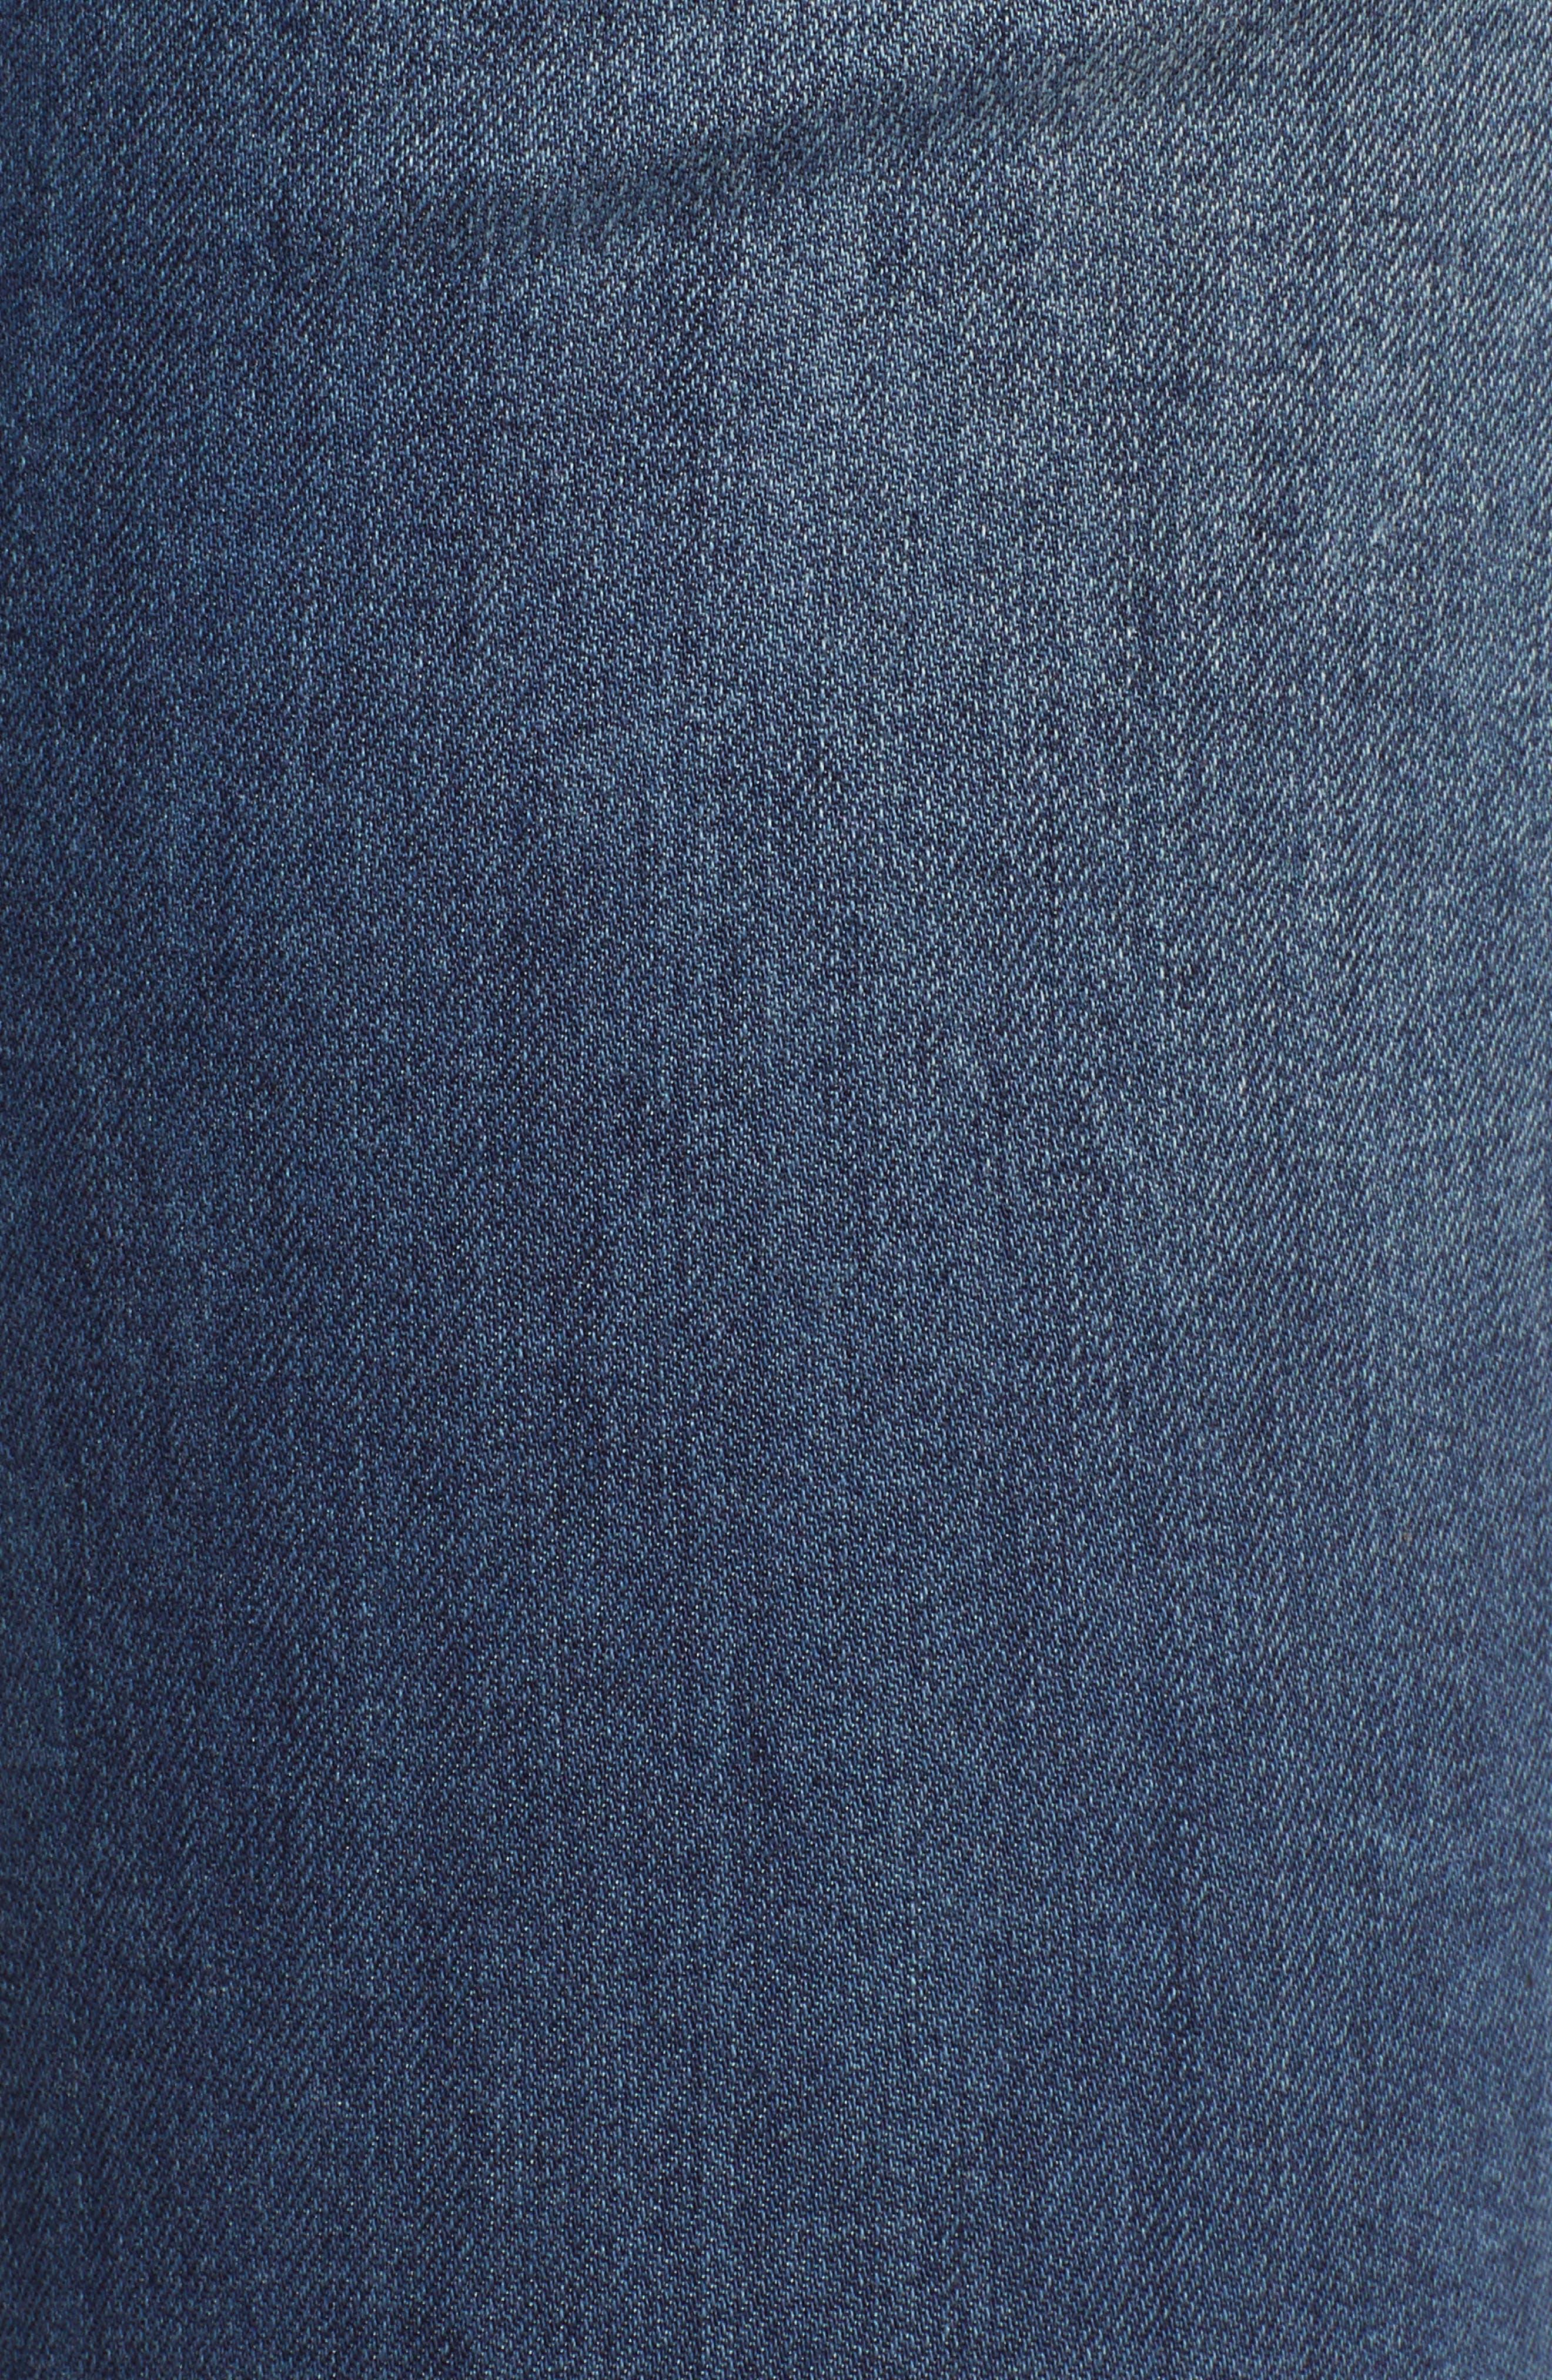 Ab-Solution High Waist Skinny Jeans,                             Alternate thumbnail 6, color,                             420